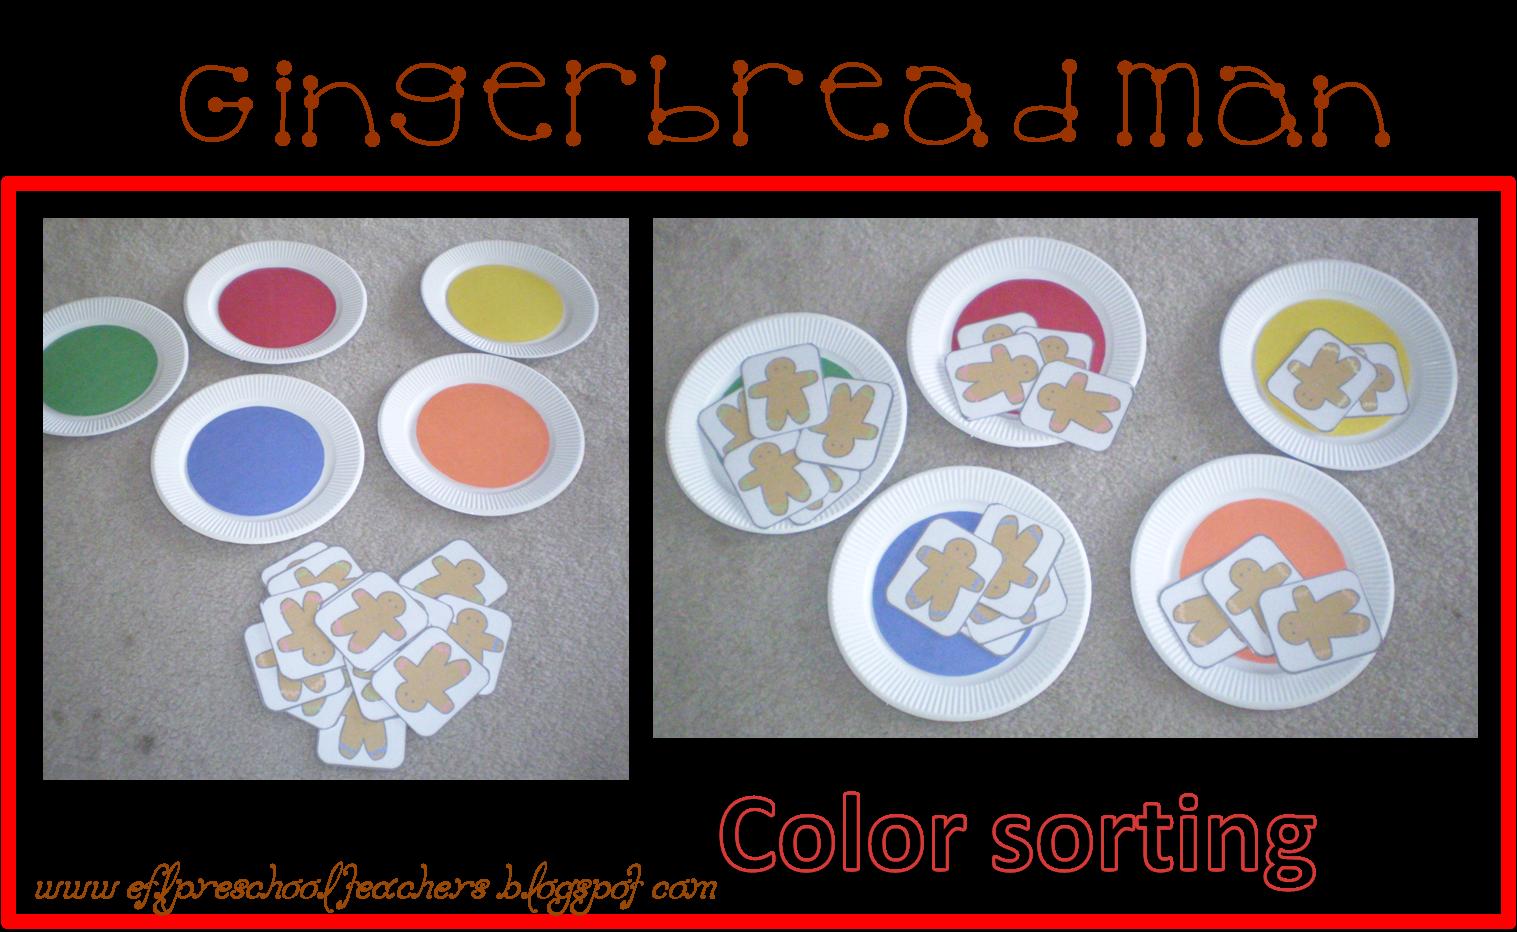 Esl Efl Preschool Teachers Gingerbread Man